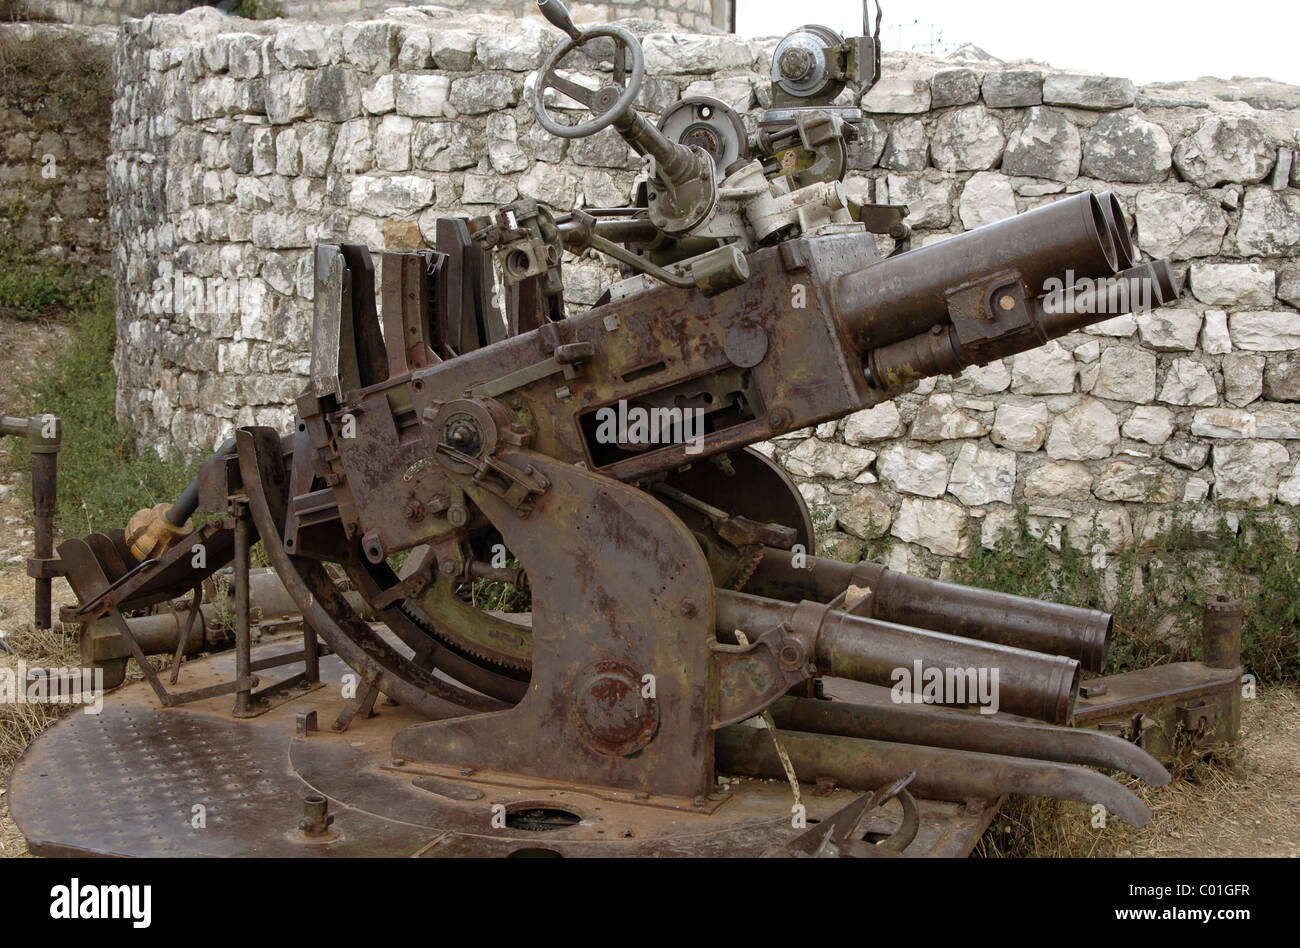 Cannon of the Second World War. Lekuresi Castle. Saranda. Albania. - Stock Image